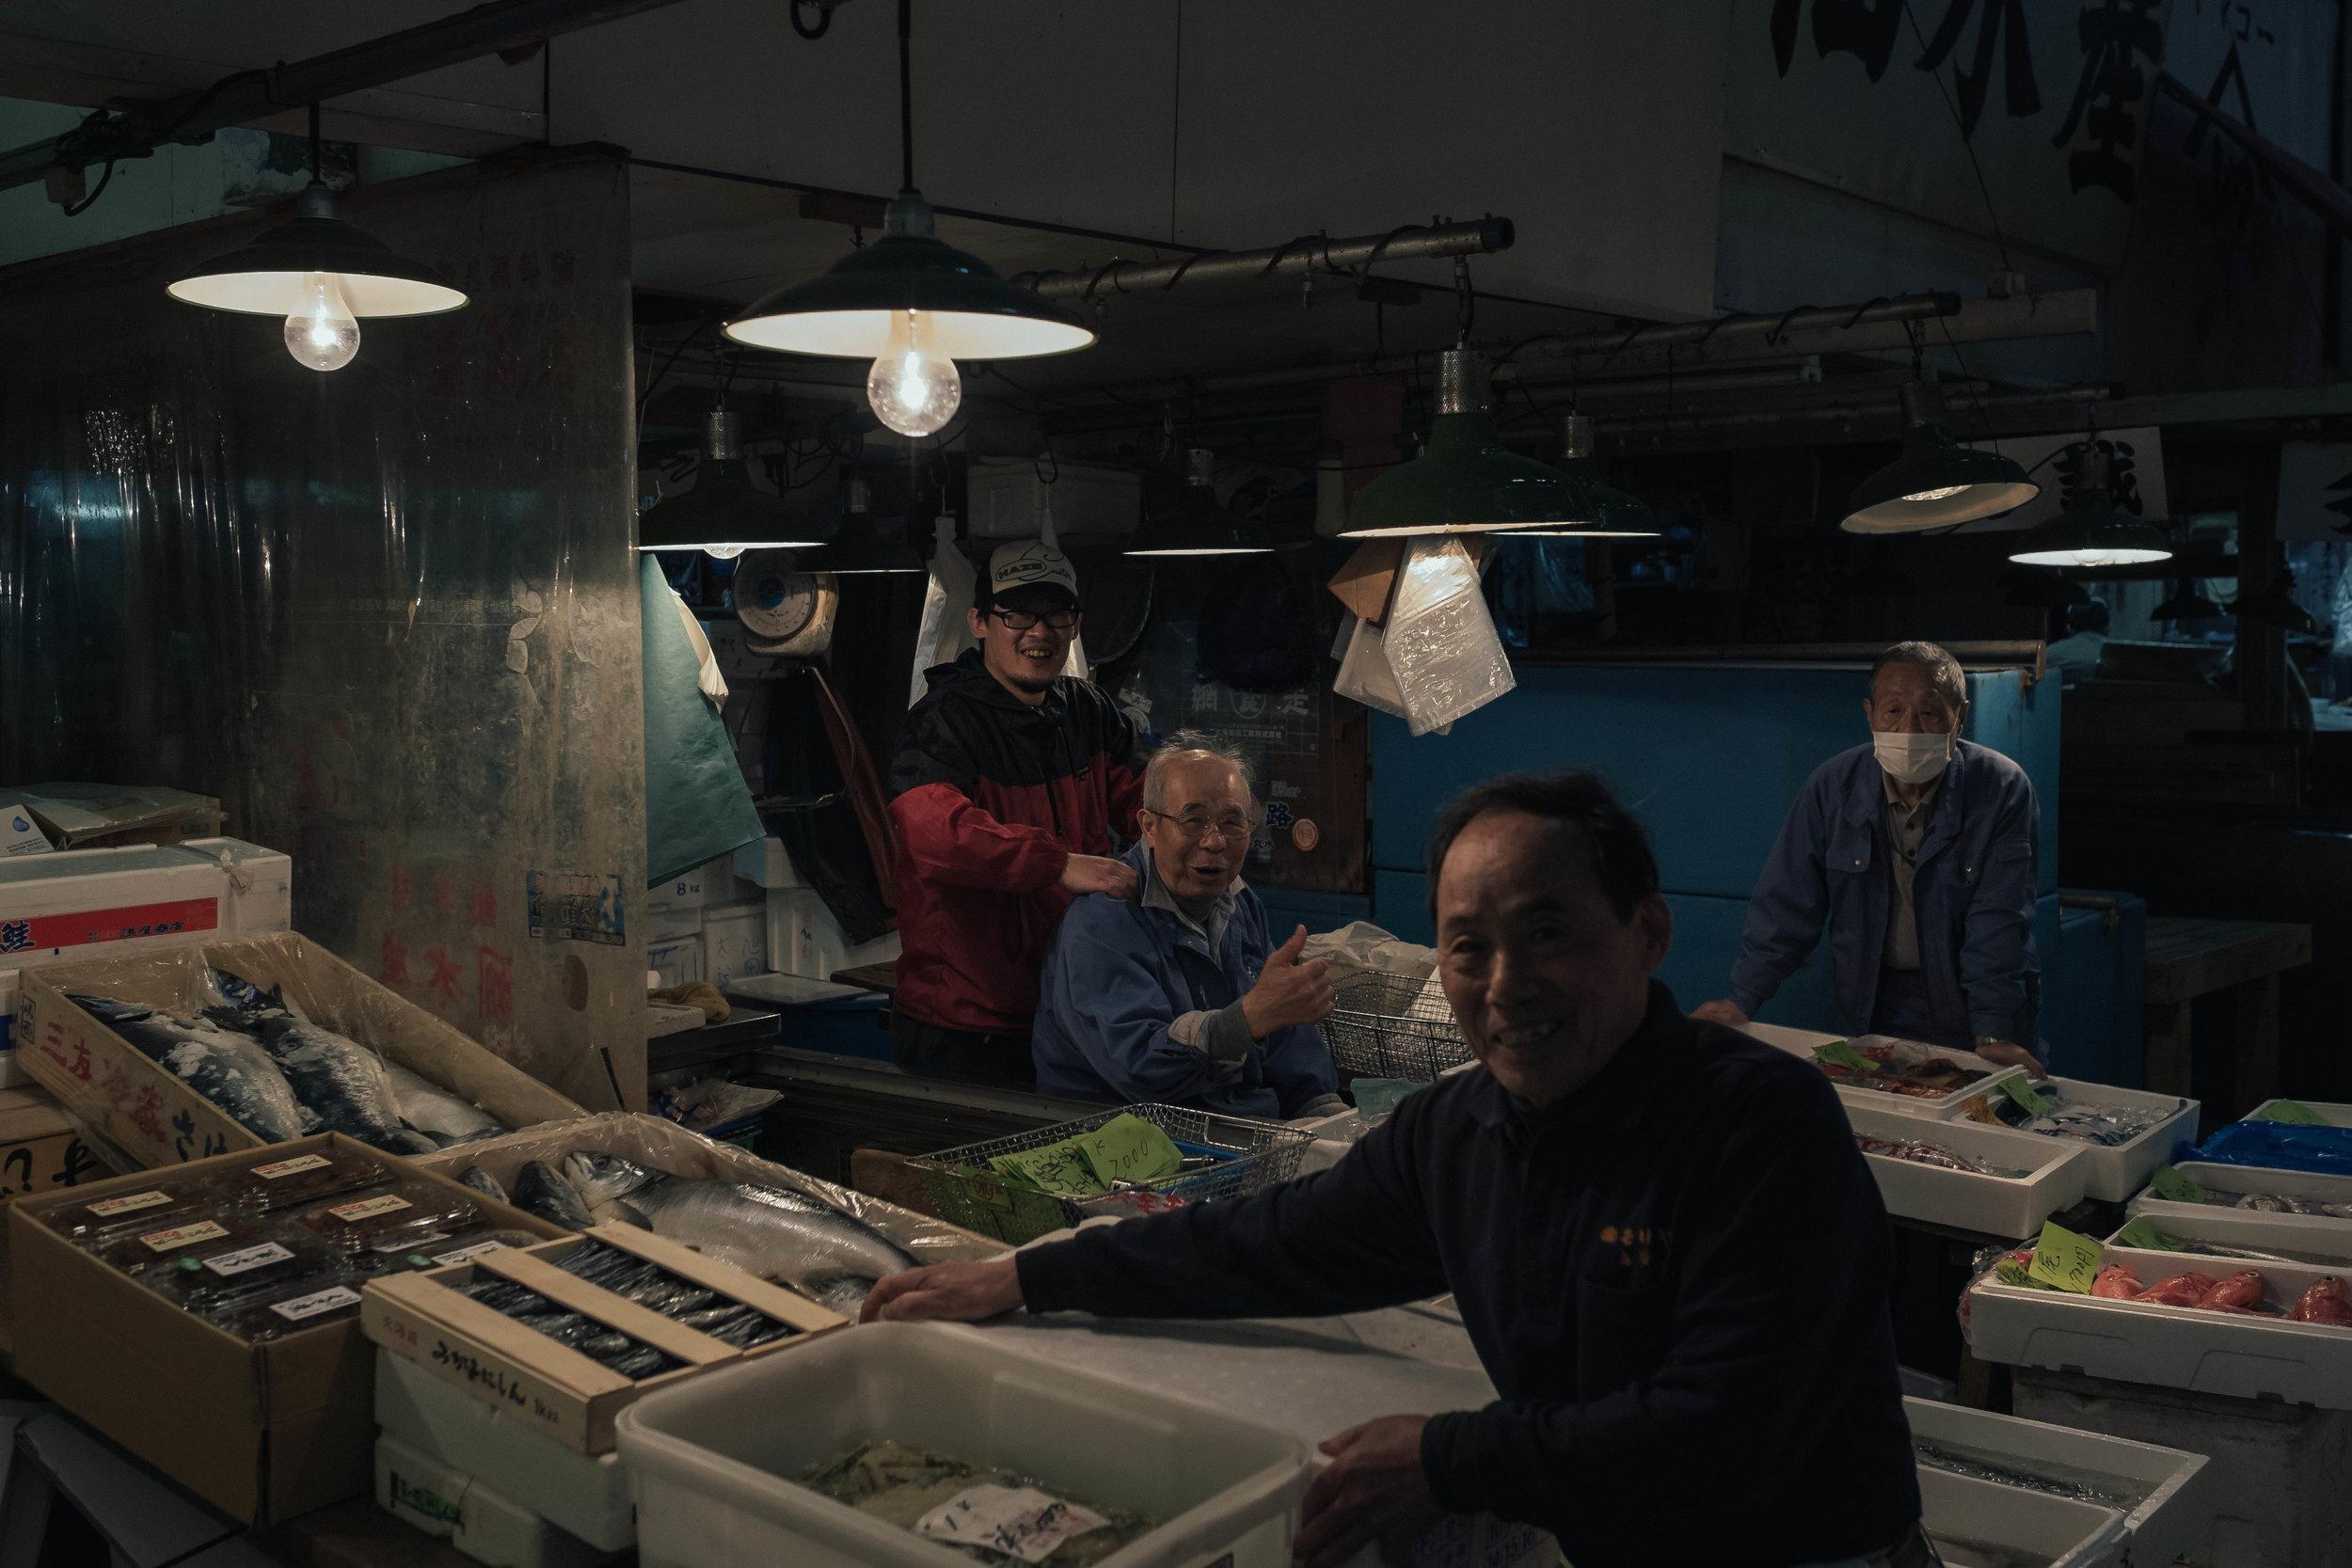 A well deserved massage at Tsukiji Fish Market, Tokyo.